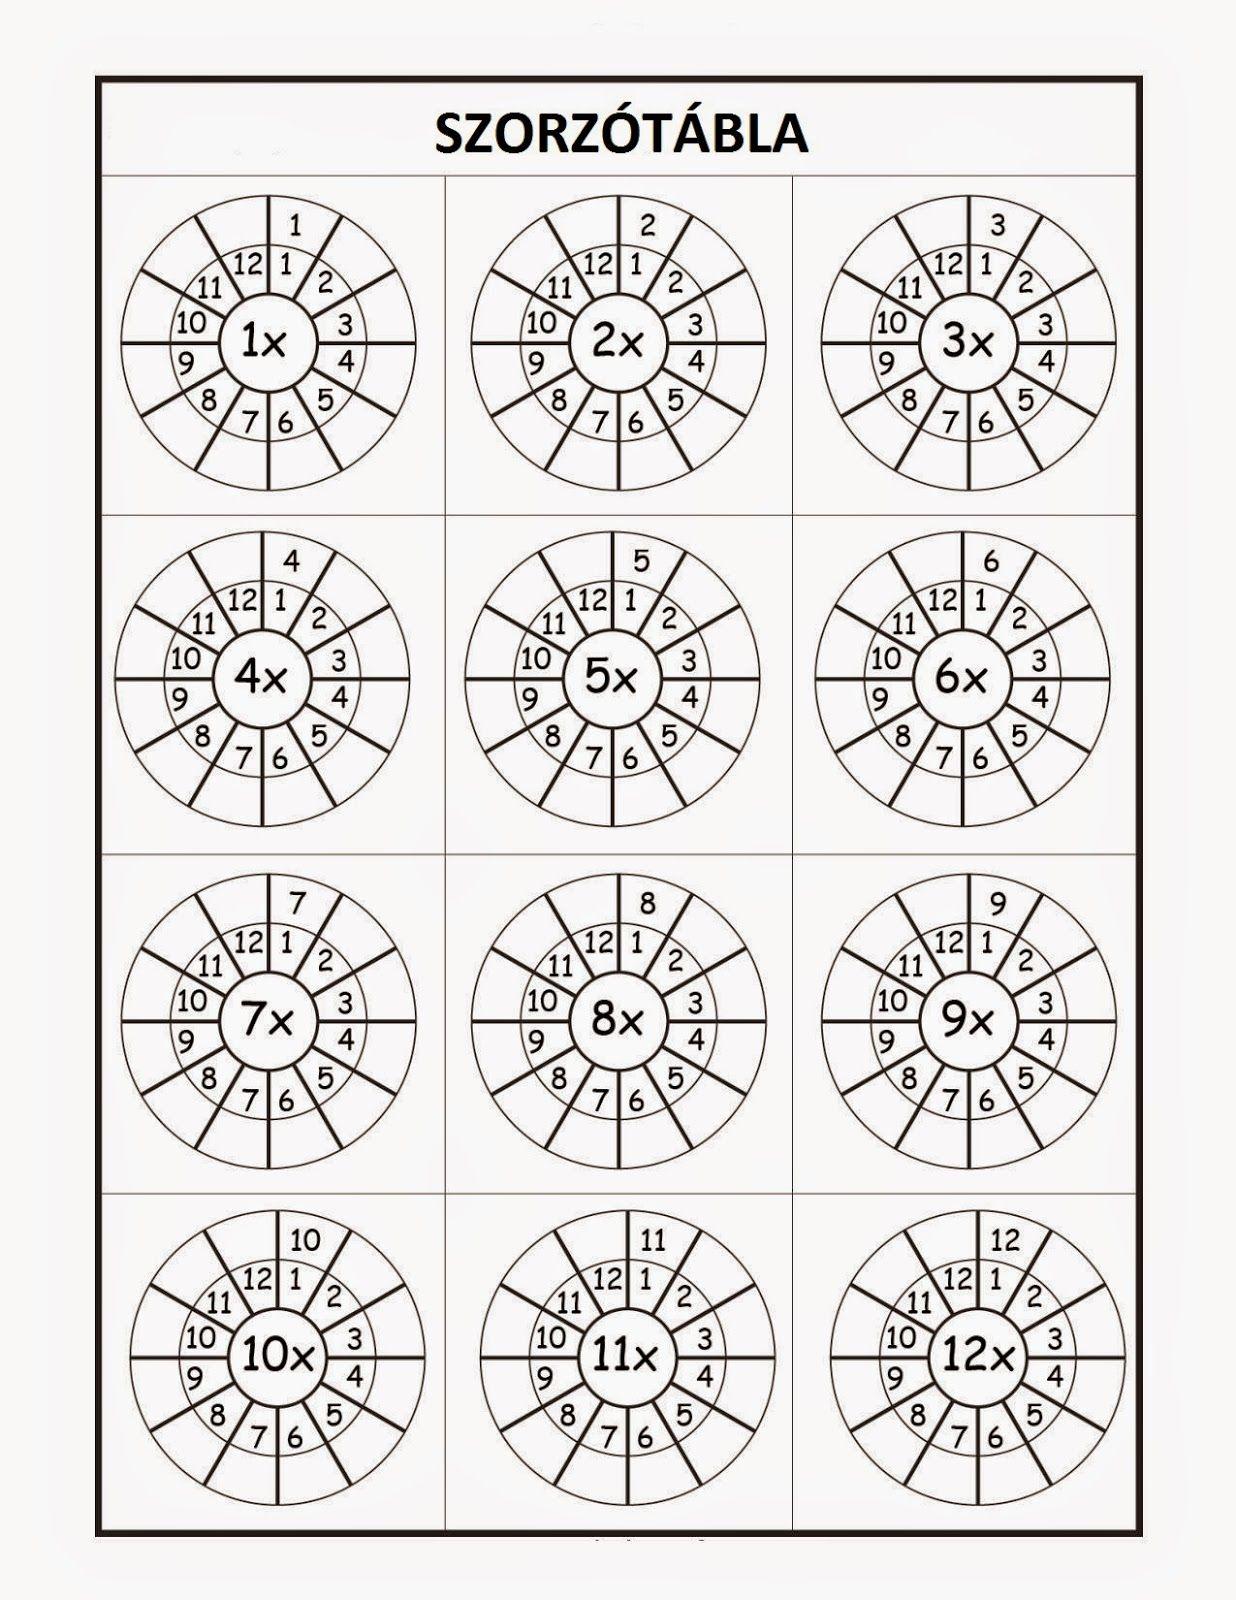 worksheet Times Test Printable marci oldala eme